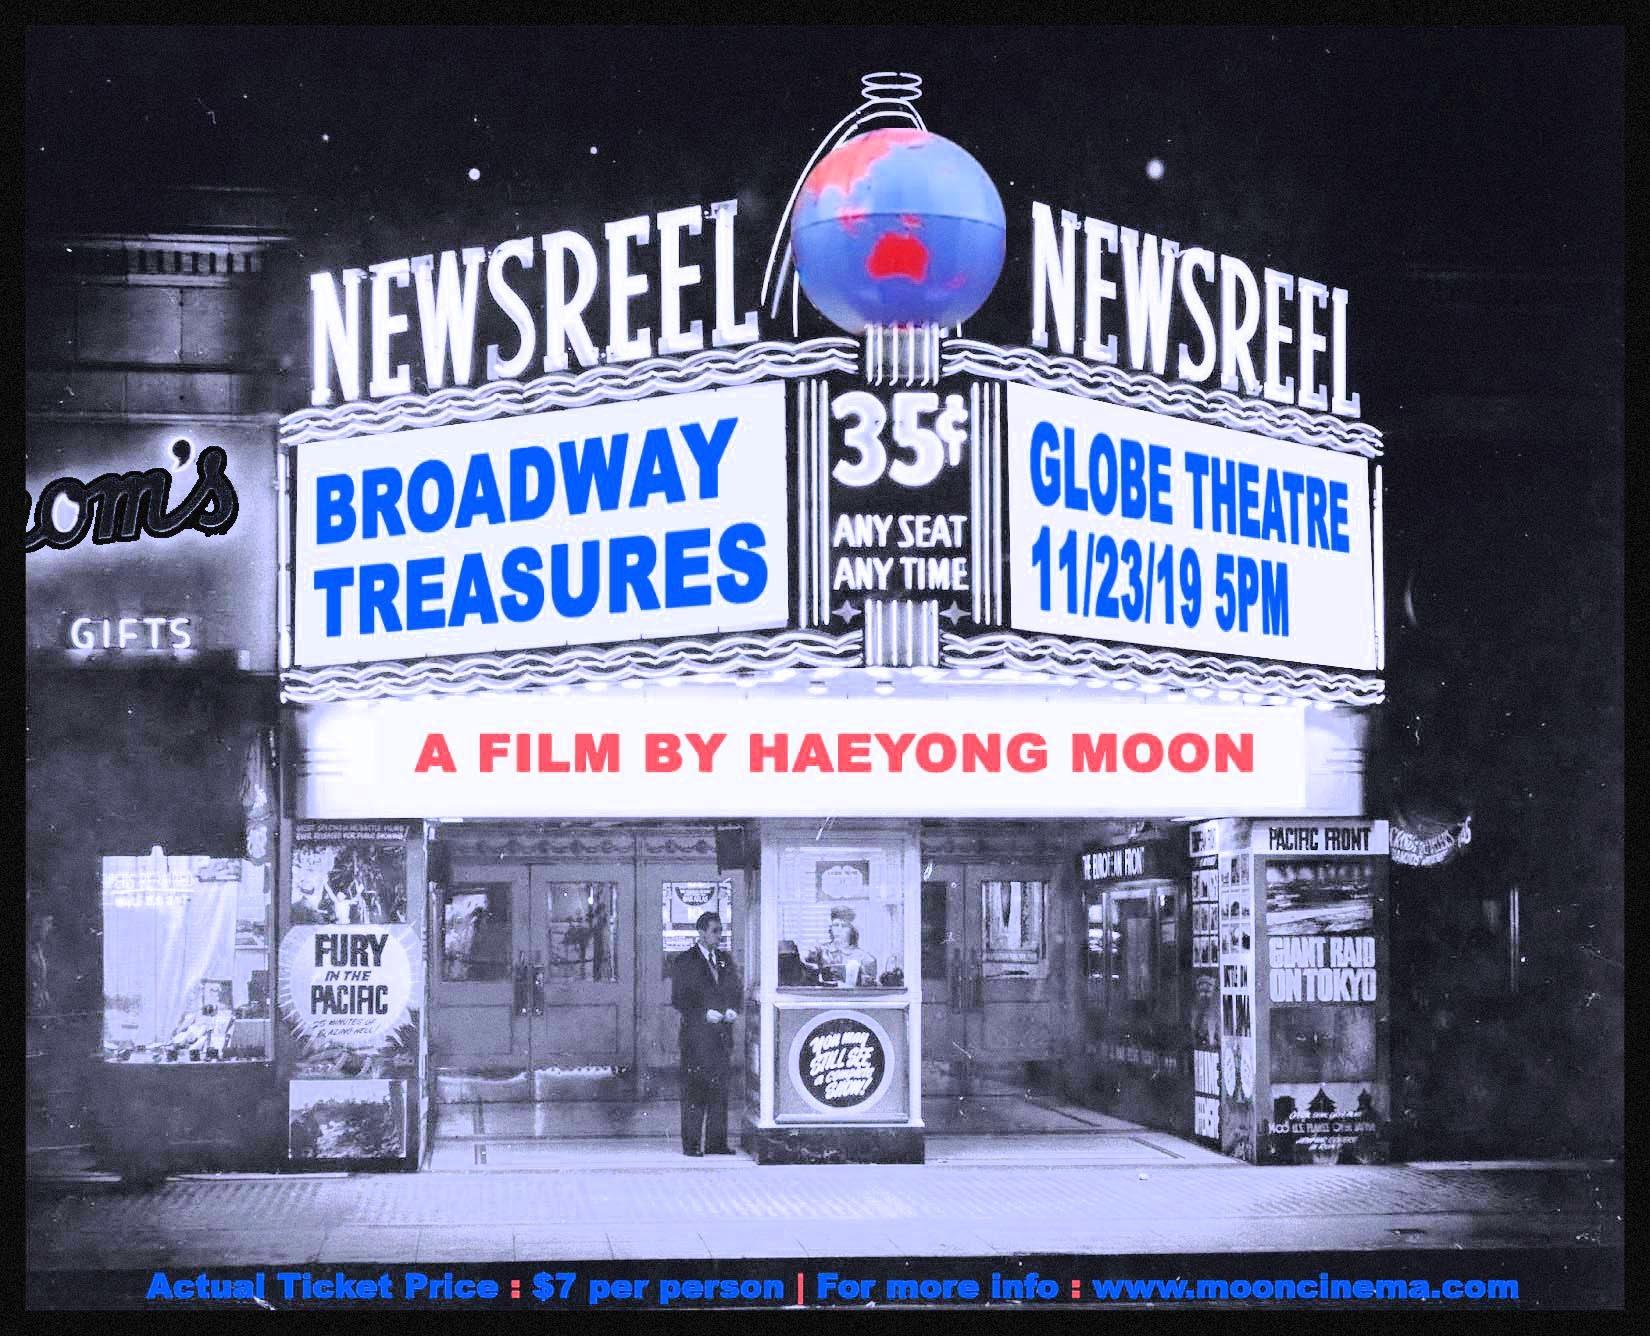 Globe screening 11/23